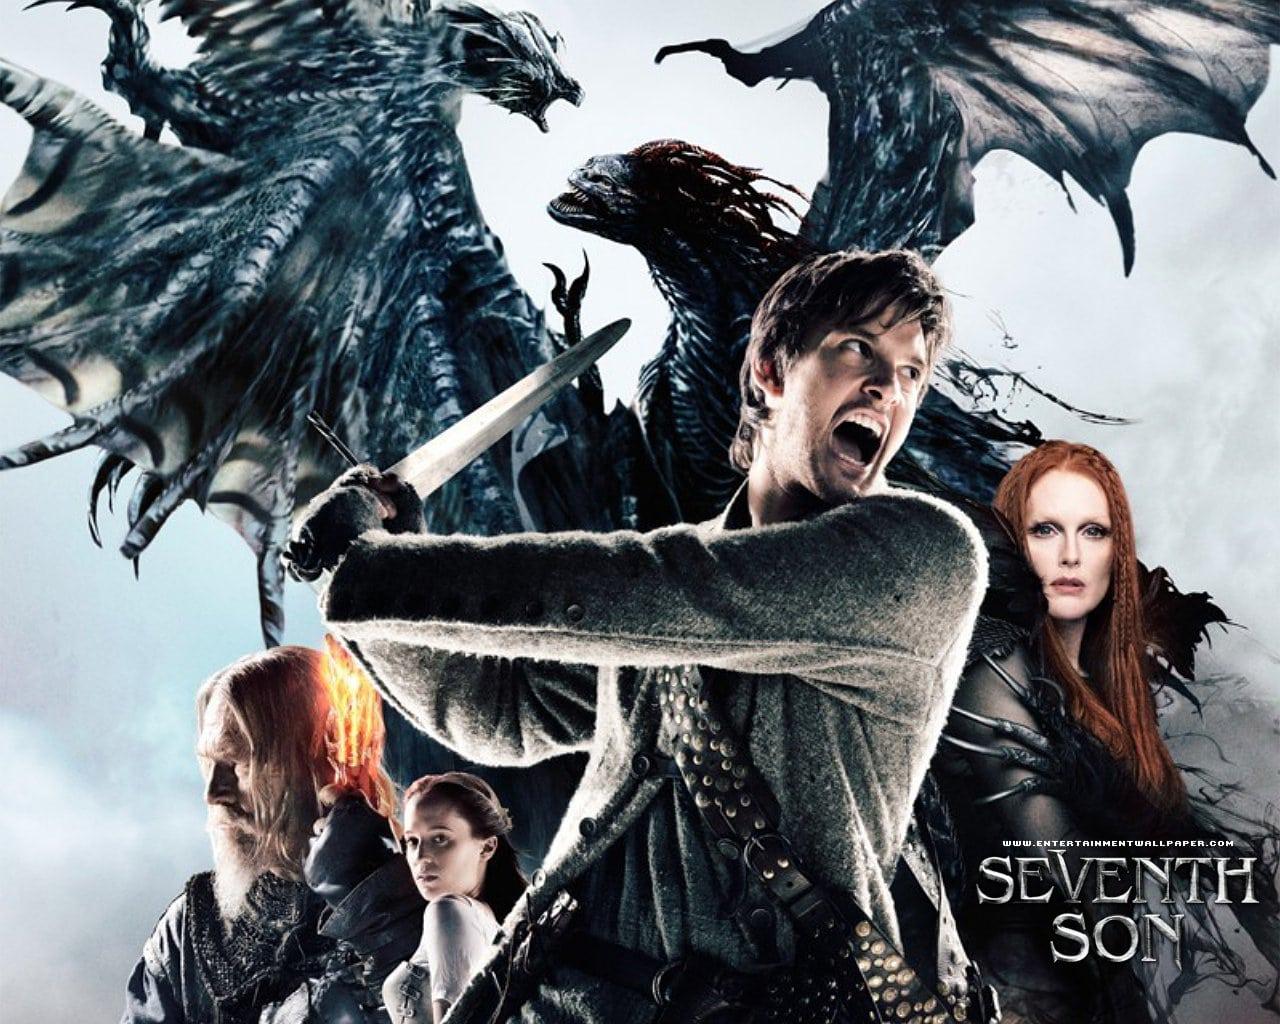 Seventh Son HD pics